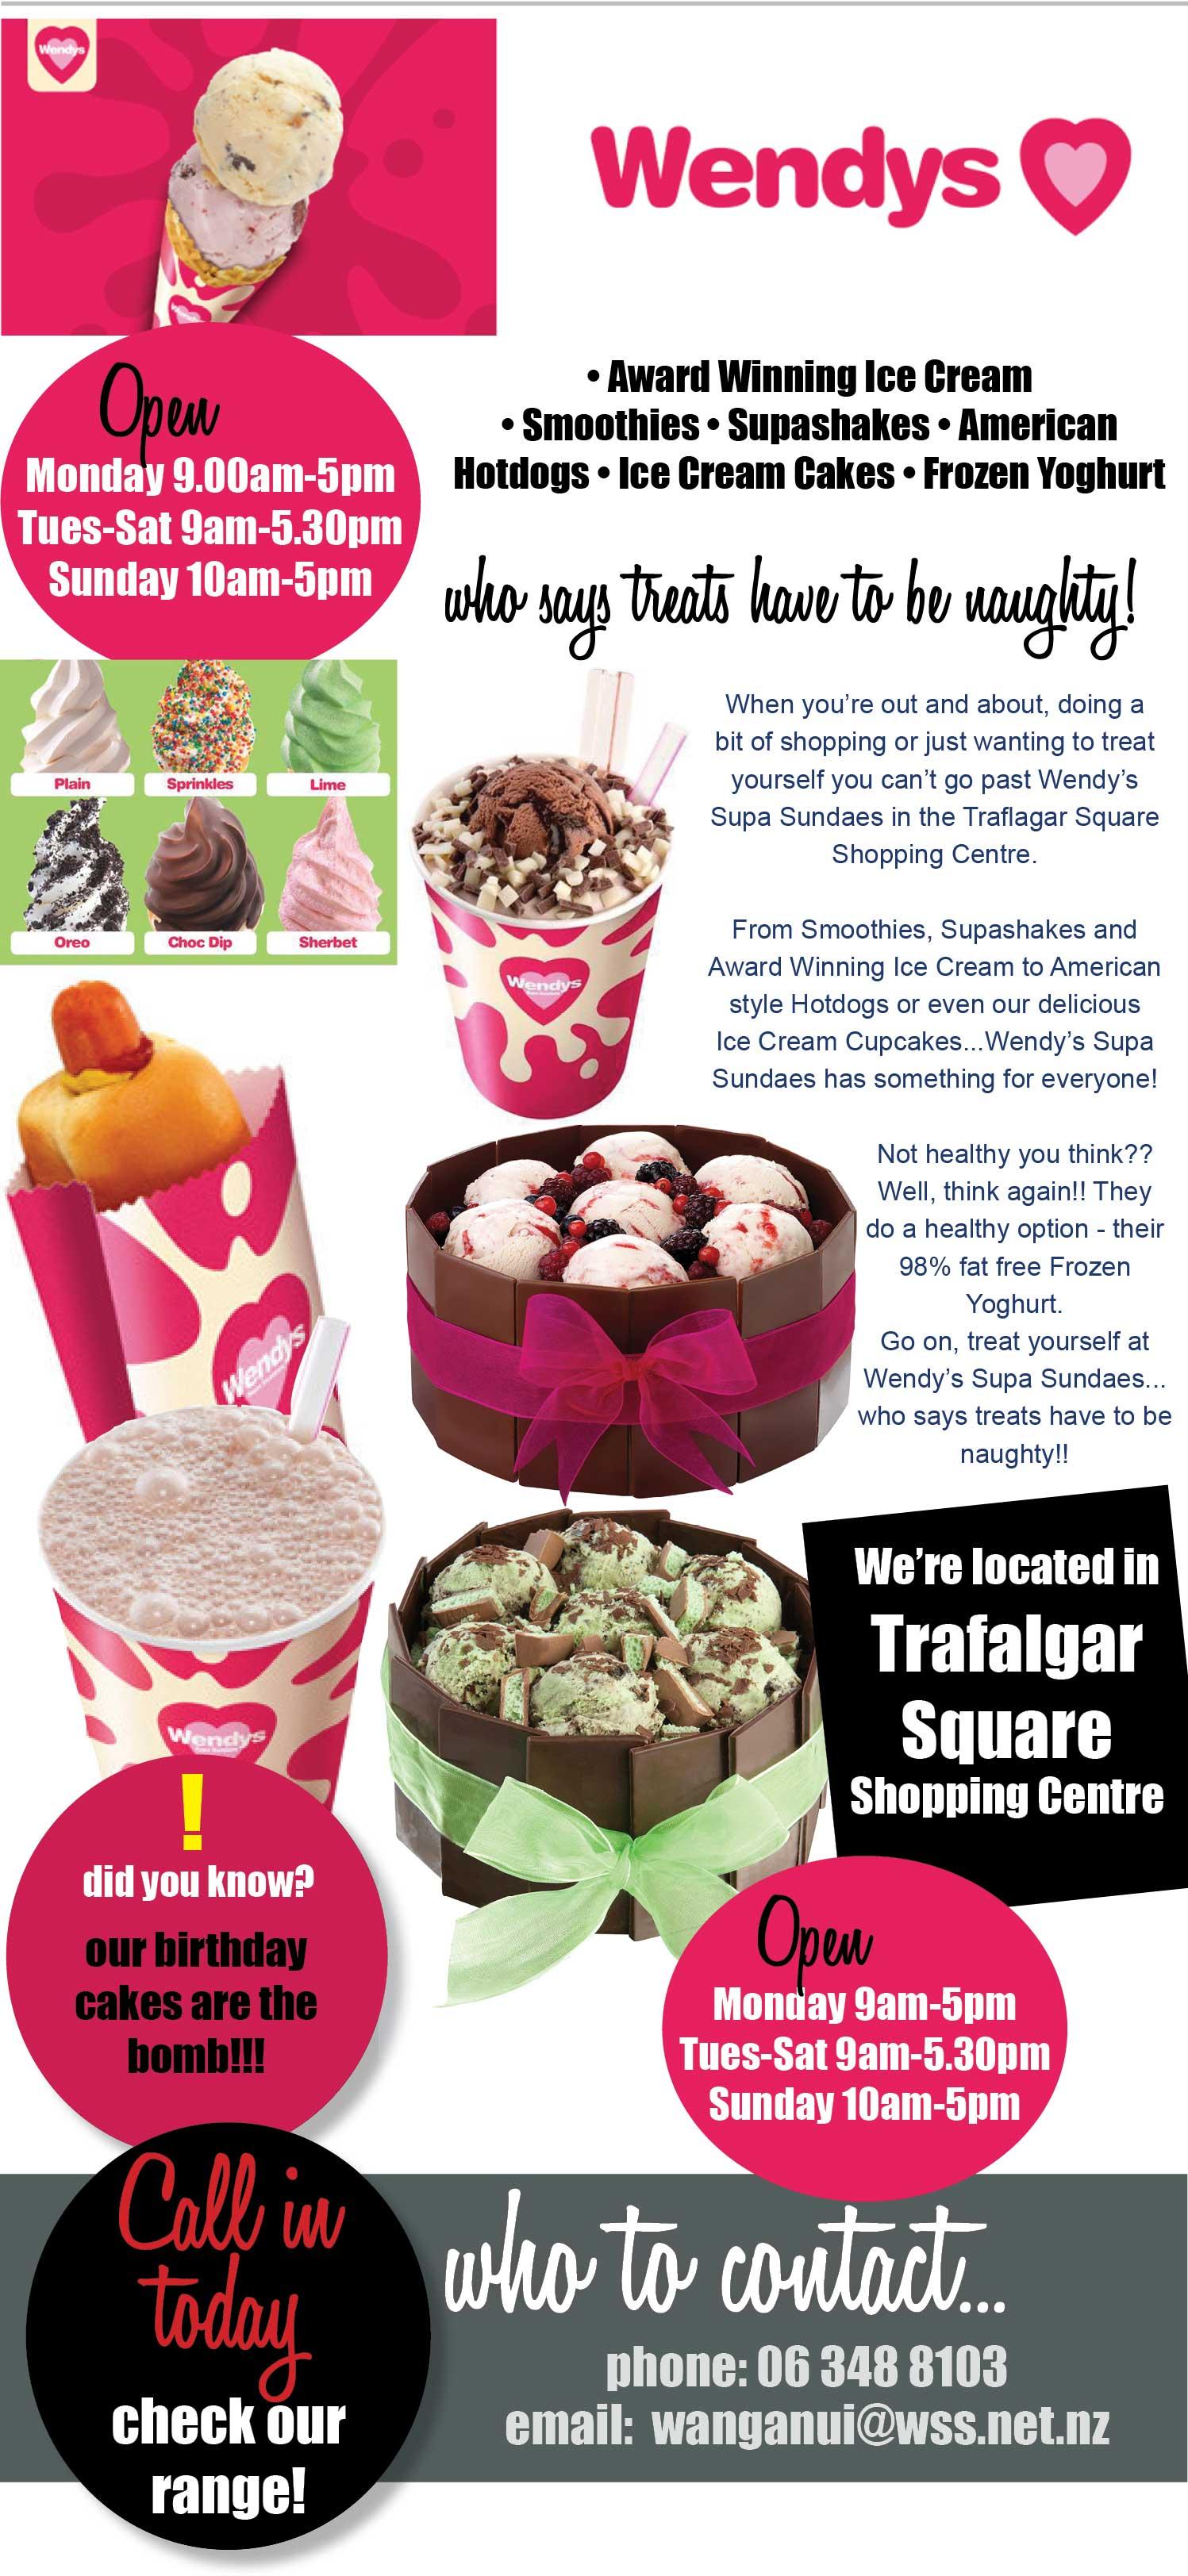 Wendy's Supa Sundaes, Trafalgar Square, Wanganui. Smoothies,Supashakes, American Hotdogs, Icre Cream Cakes, Frozen Yoghurt